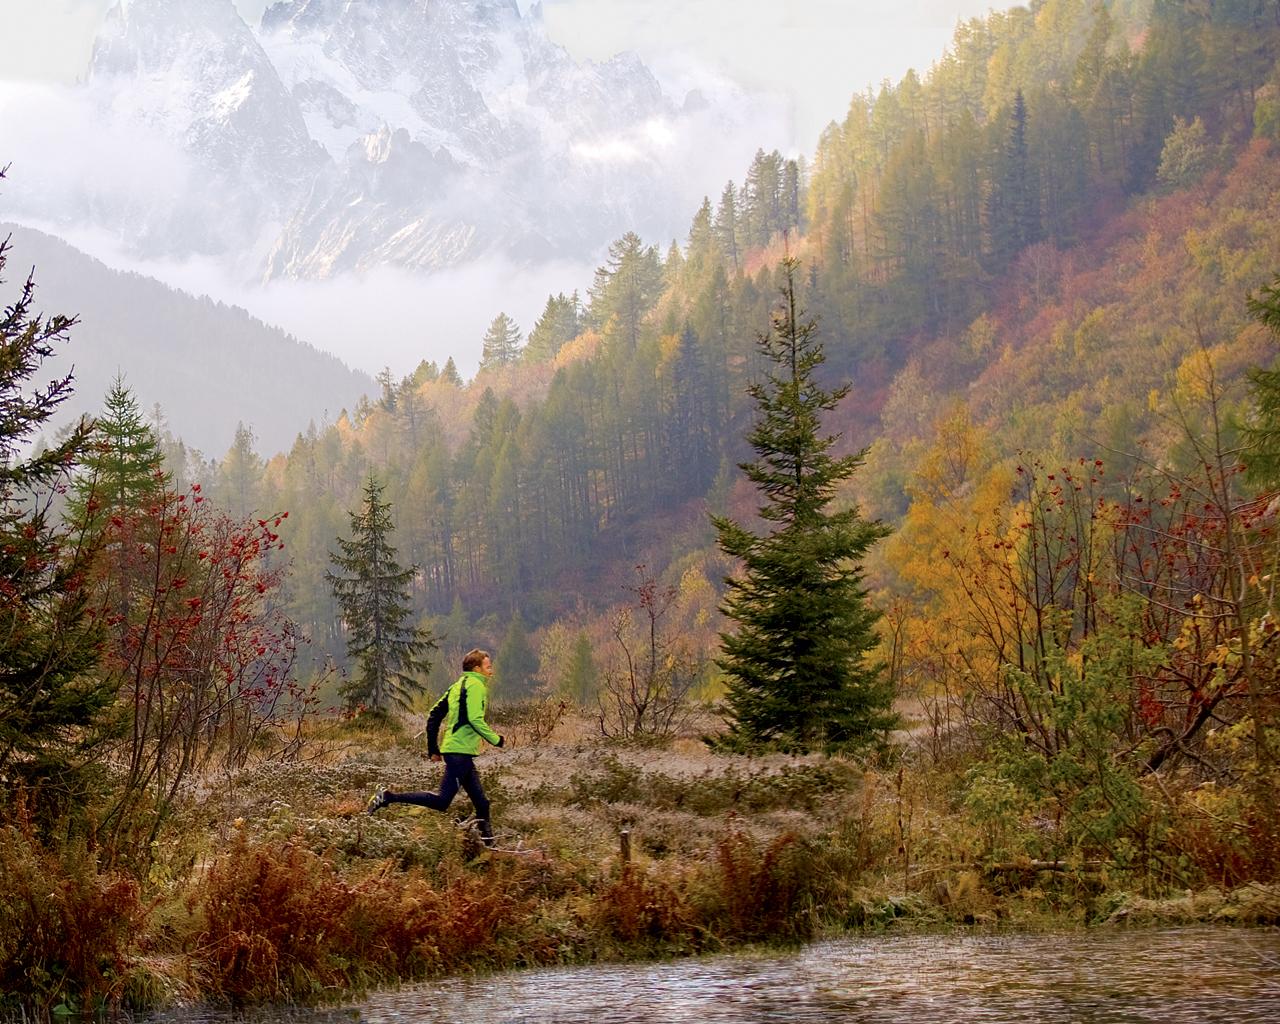 Rave Run Chamonix France Runners World 1280x1024